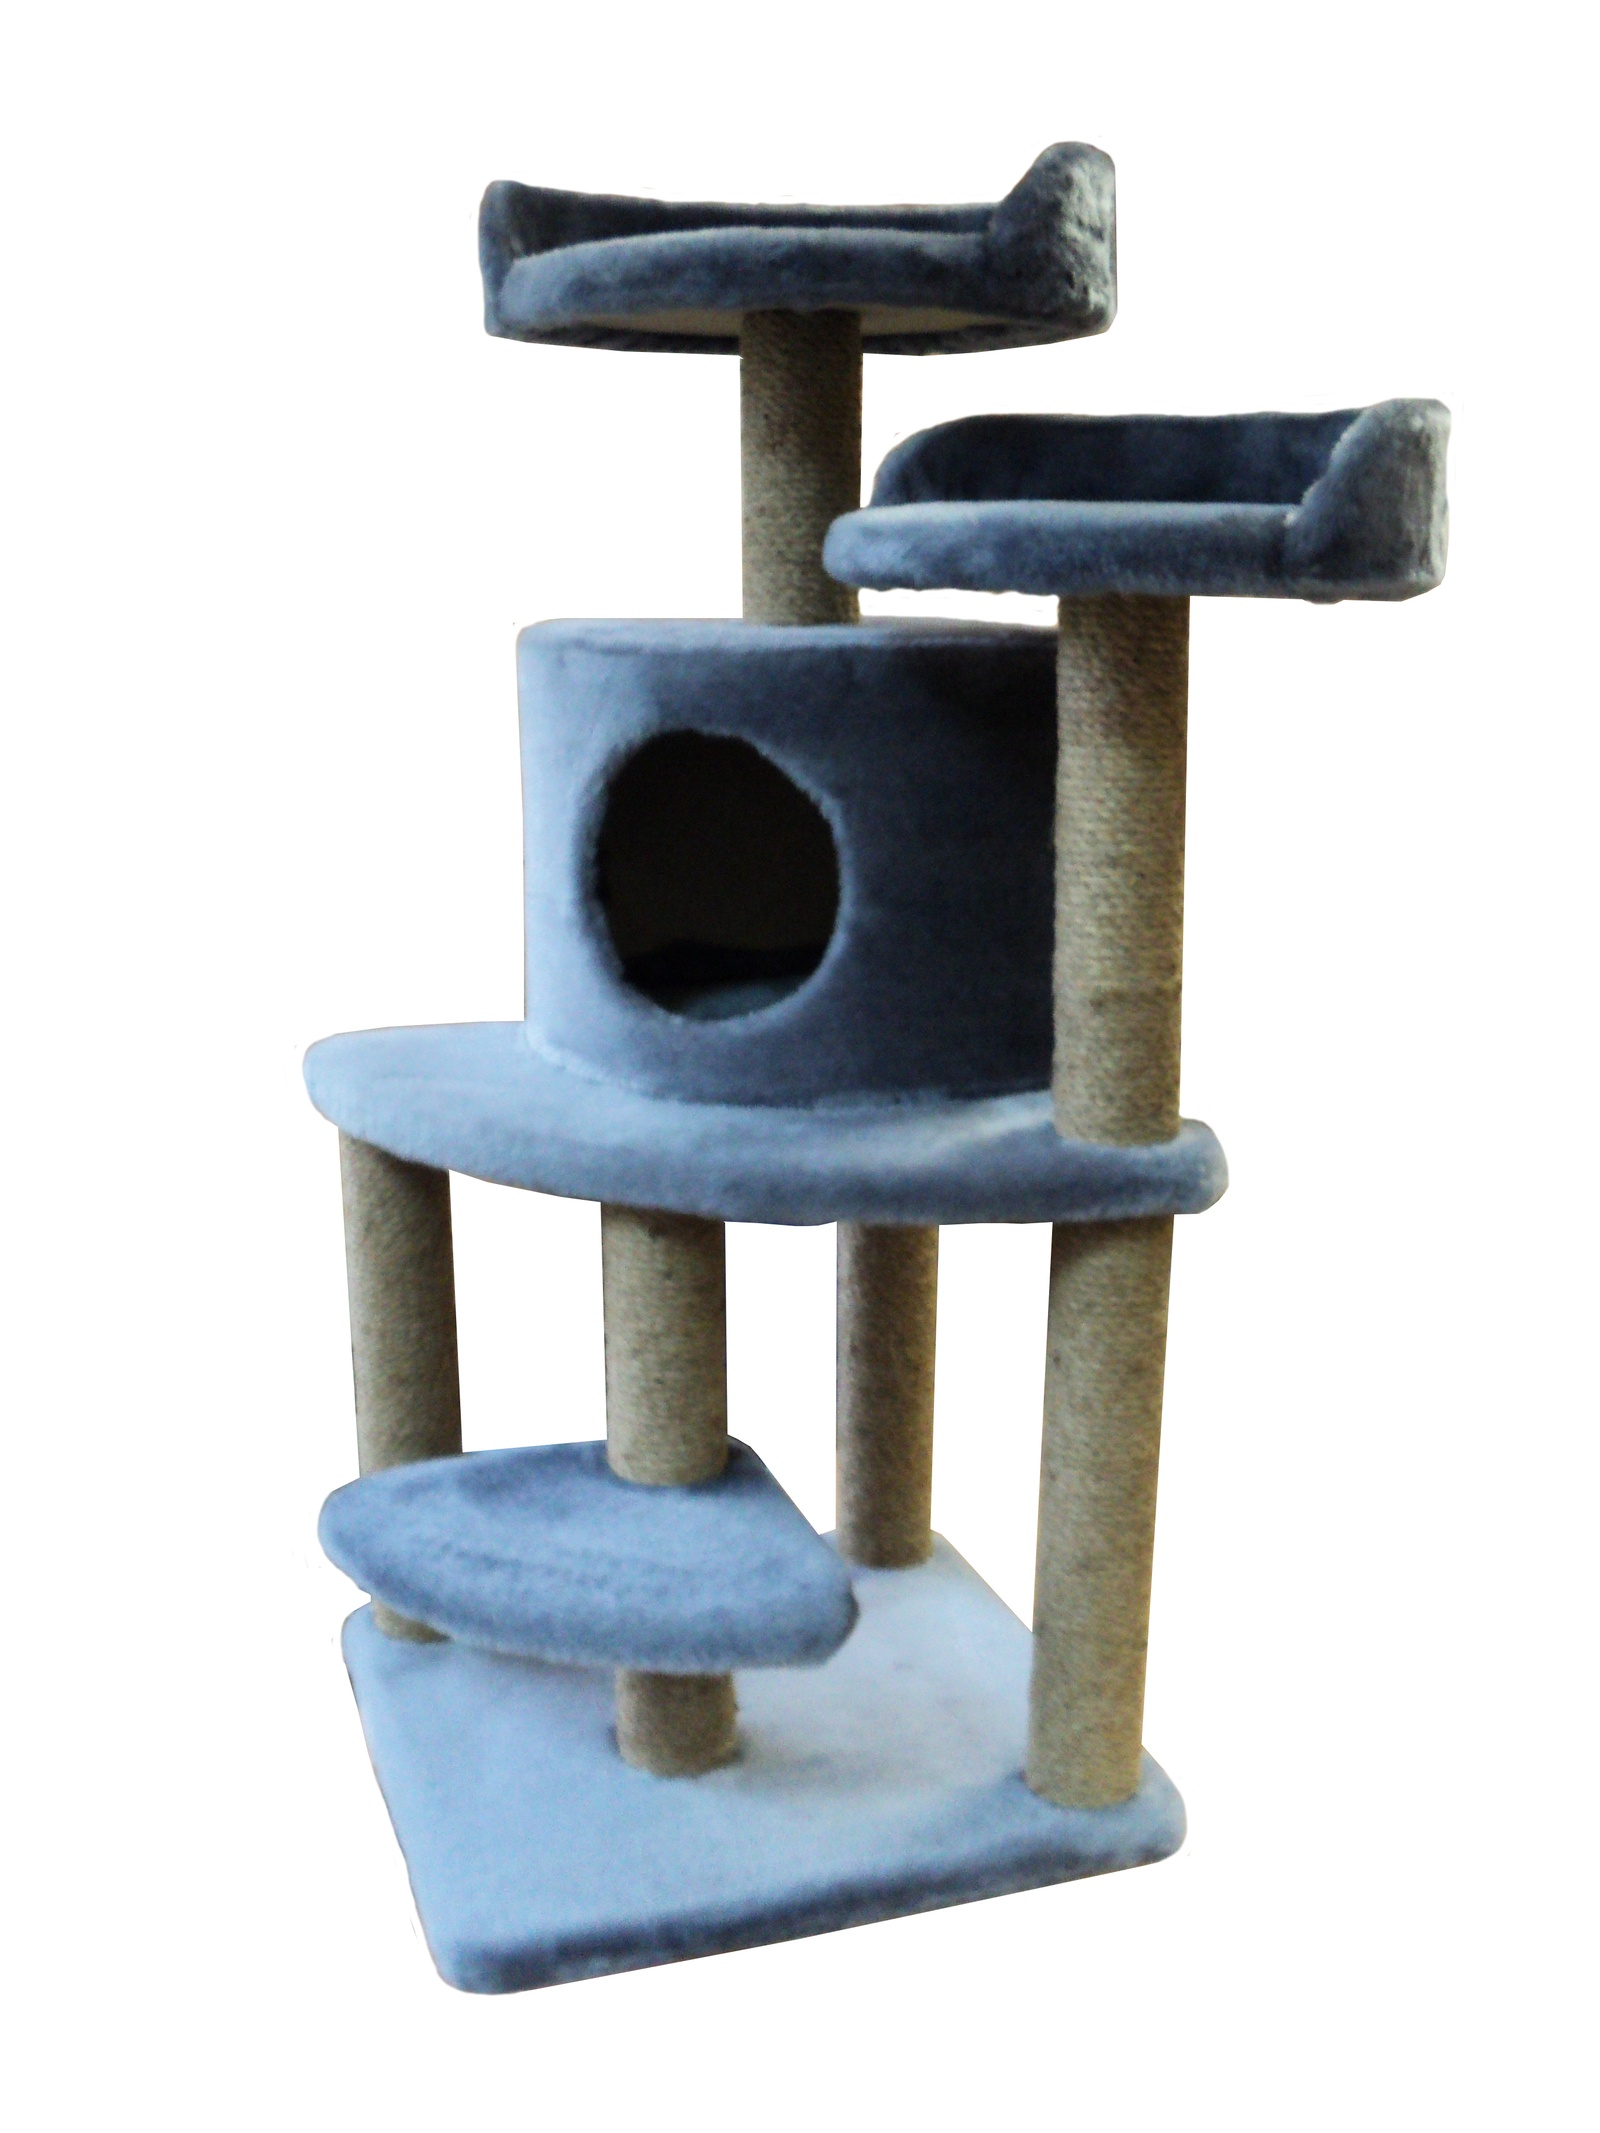 Домик - когтеточка Майя, серый, джут 50х50х100 домик когтеточка барсик серый джут 60х60х110